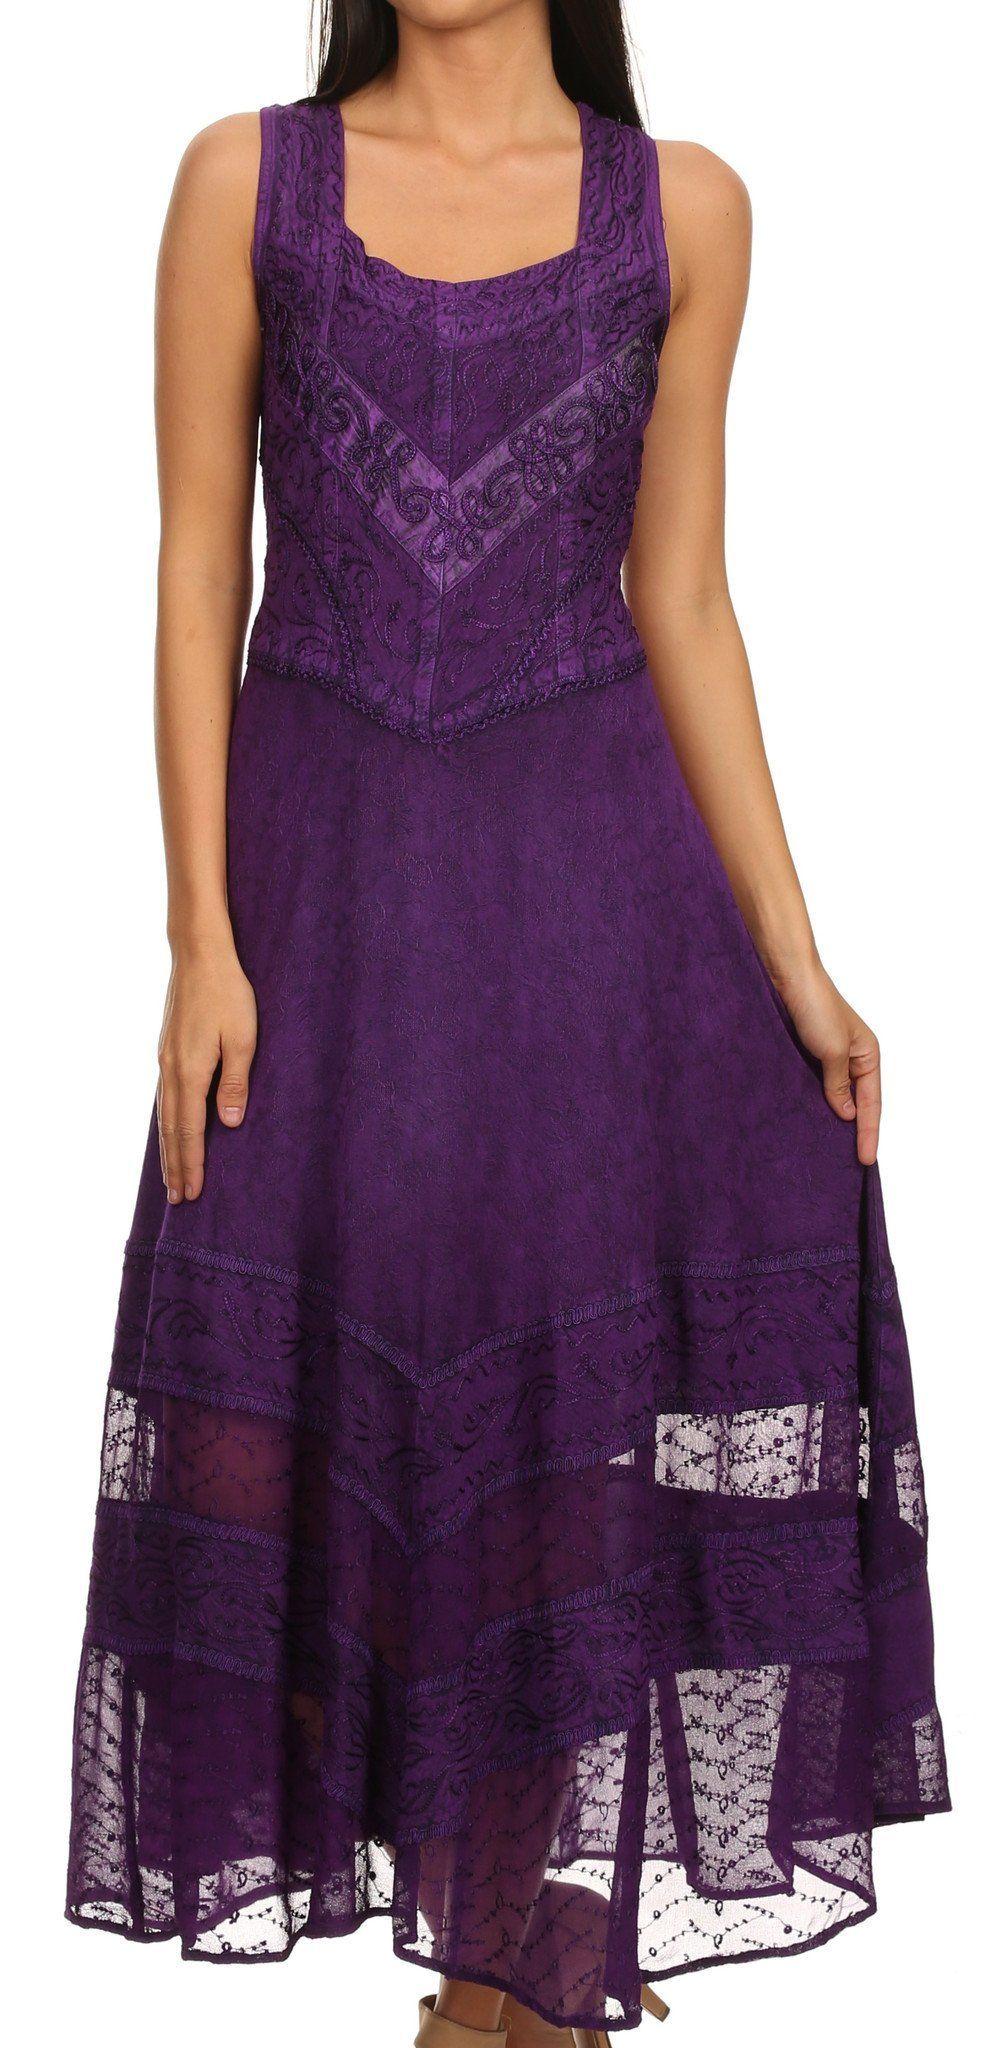 Purple dresses to wear to a wedding  Sakkas Zendaya Stonewashed Rayon Embroidered Floral Vine Sleeveless